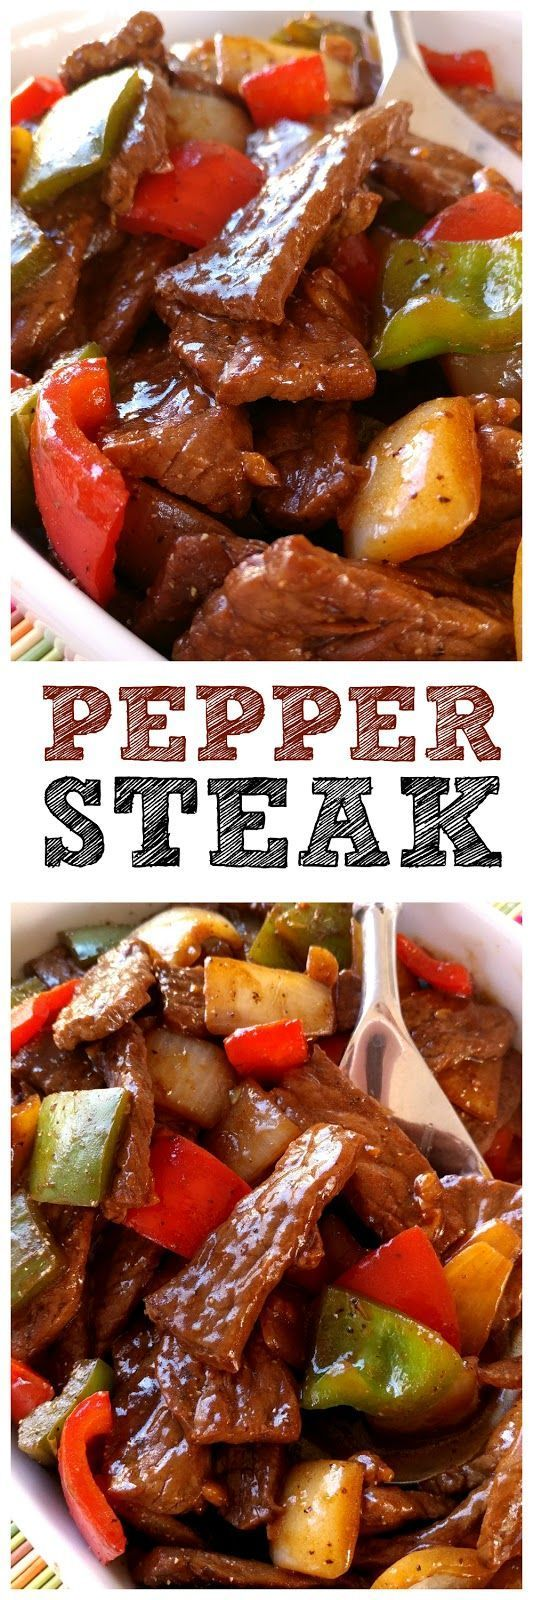 Ingredients: Pepper Steak: 1.5 lbs. sirloin or bottom round steak 3 tablespoons soy sauce 1 teaspoon black pepper Vegetable...